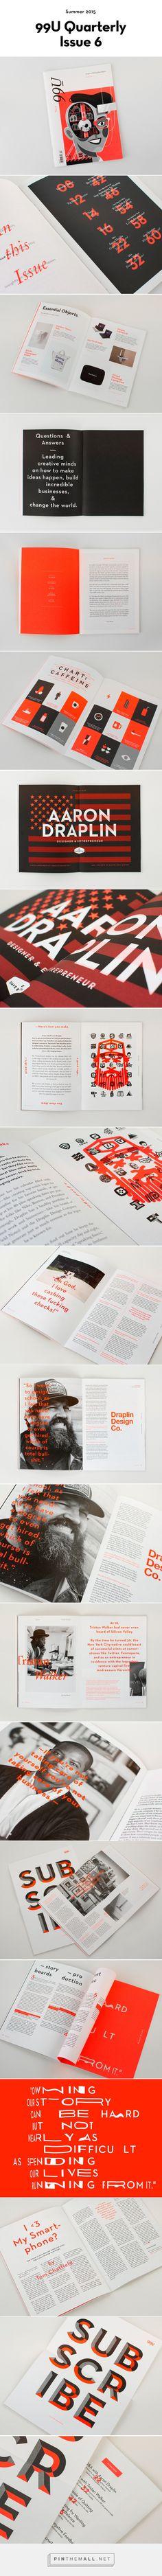 99U Quarterly — Issue 6